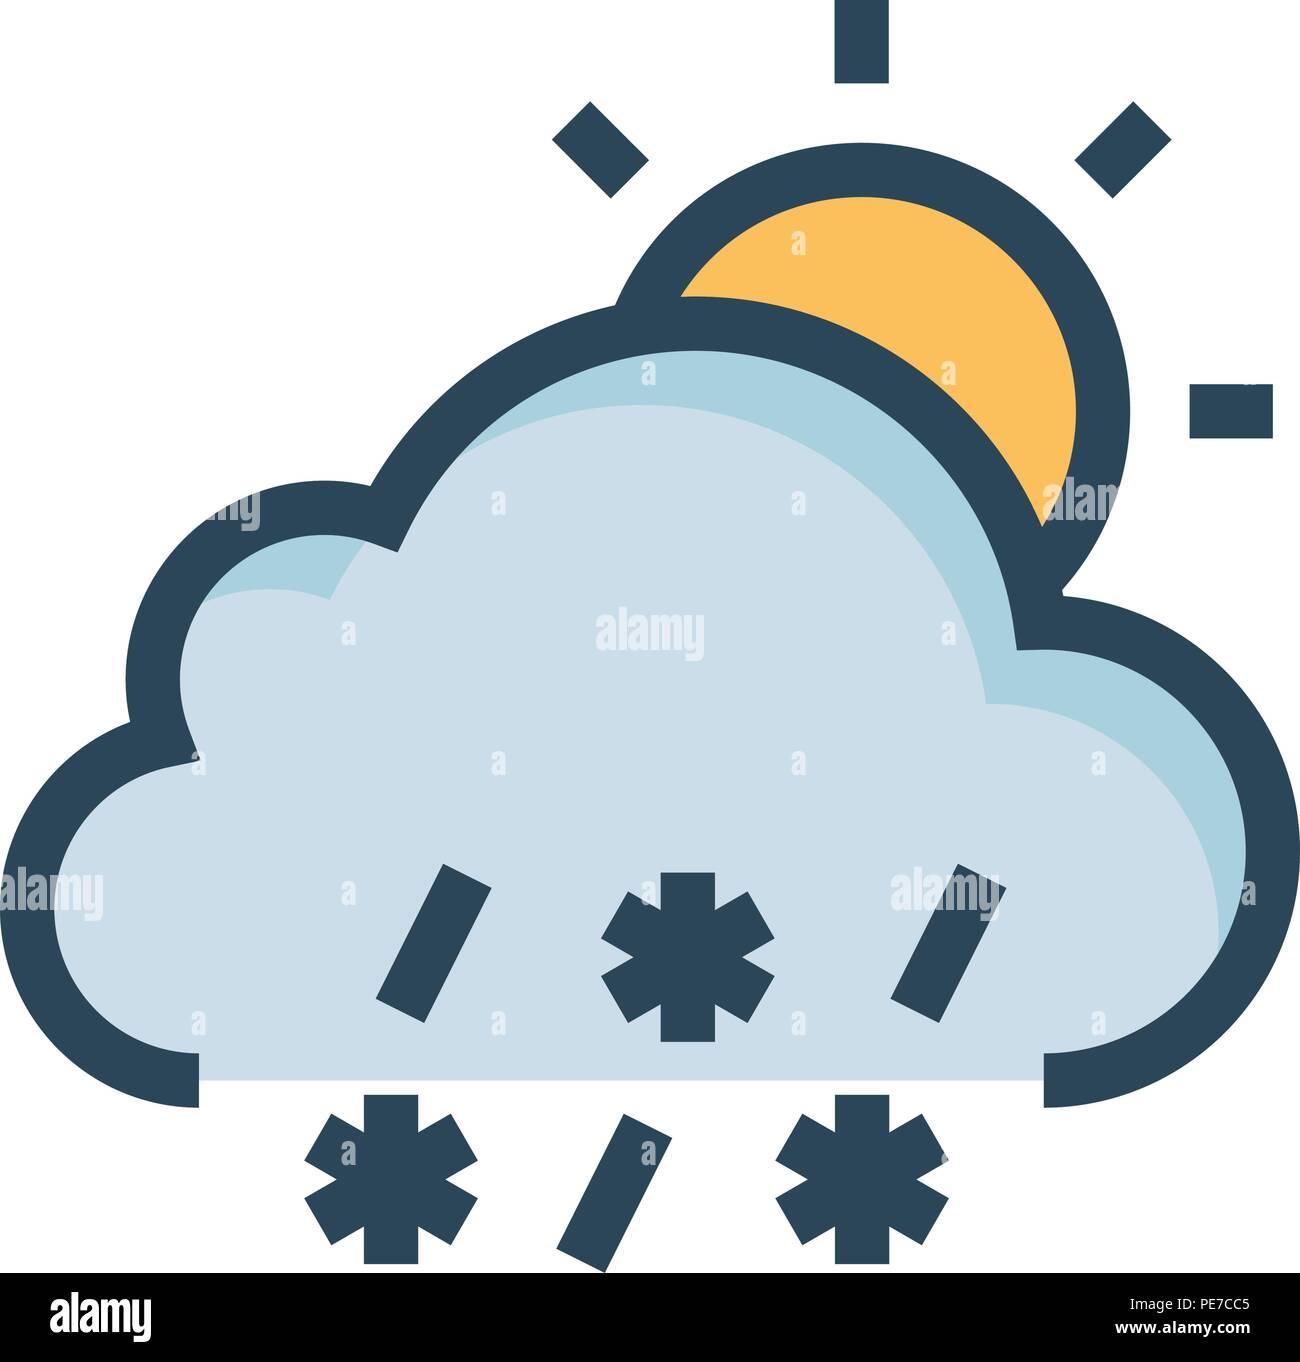 cloud - Stock Image